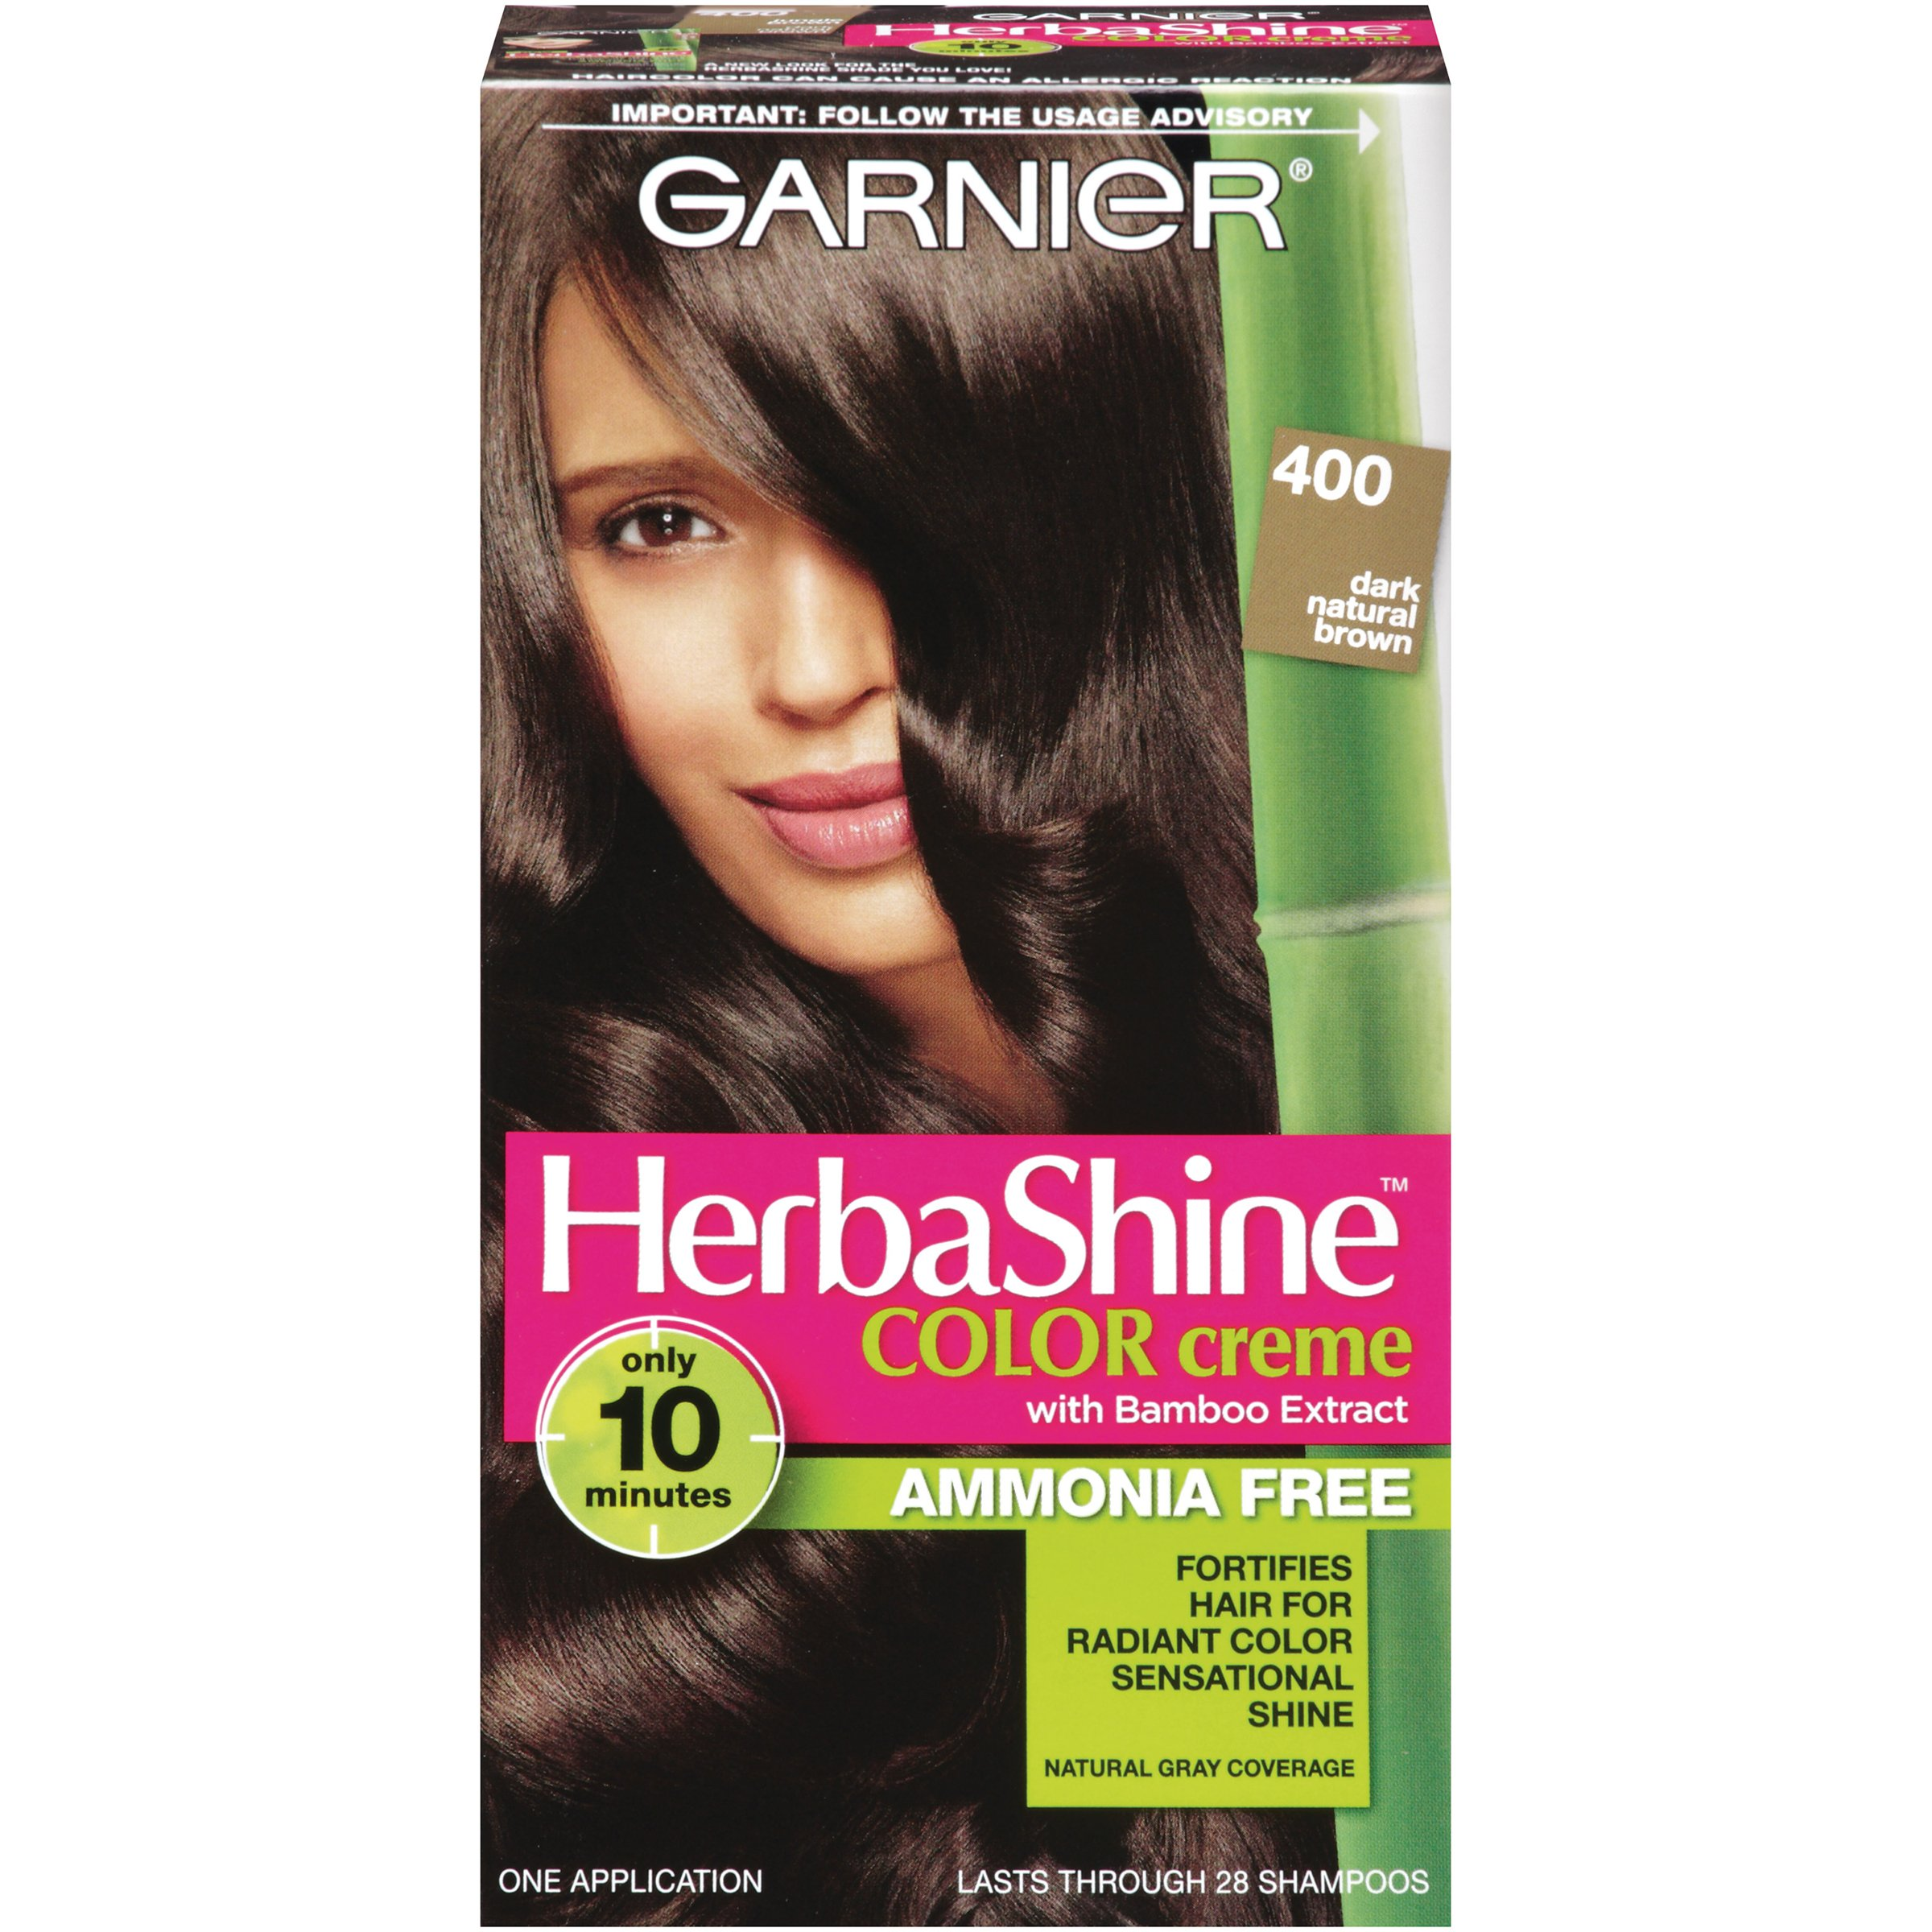 Amazon garnier herbashine haircolor 800 medium natural garnier herbashine haircolor 400 dark natural brown nvjuhfo Choice Image